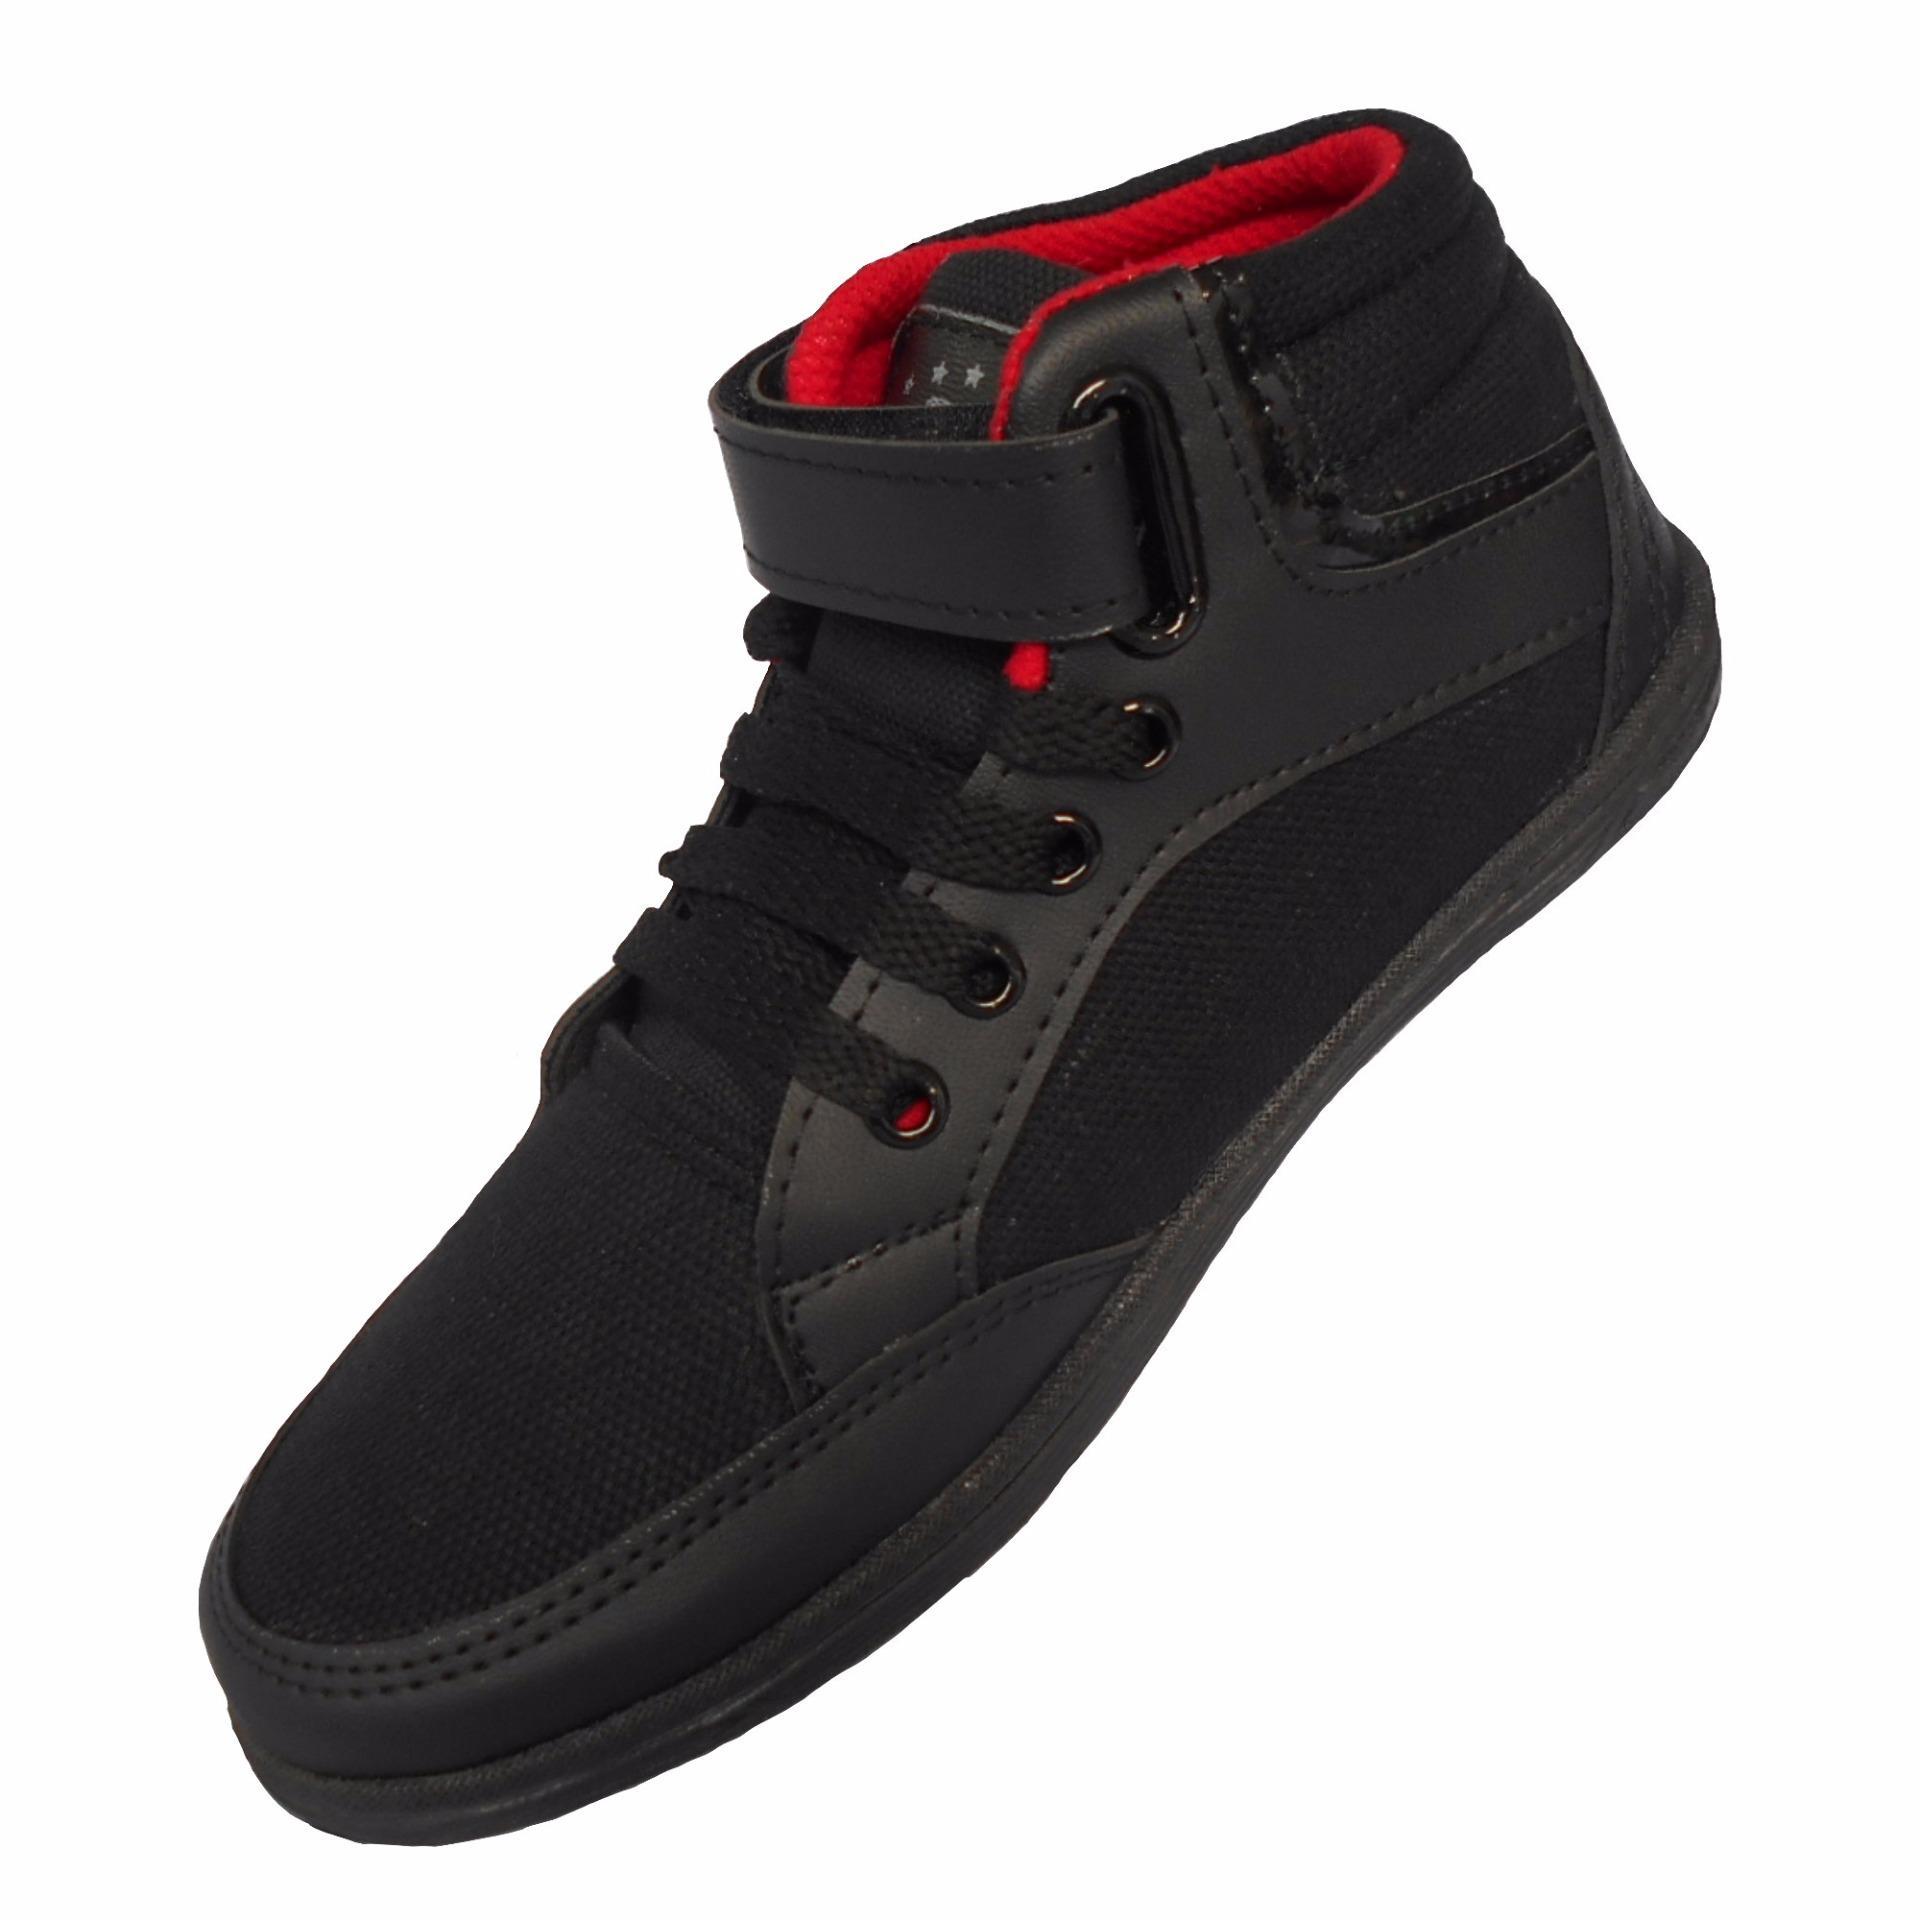 Sepatu Anak Sekolah TK SD Usia 6-10 Th - Jak3337 - Hitam 622786f4cc